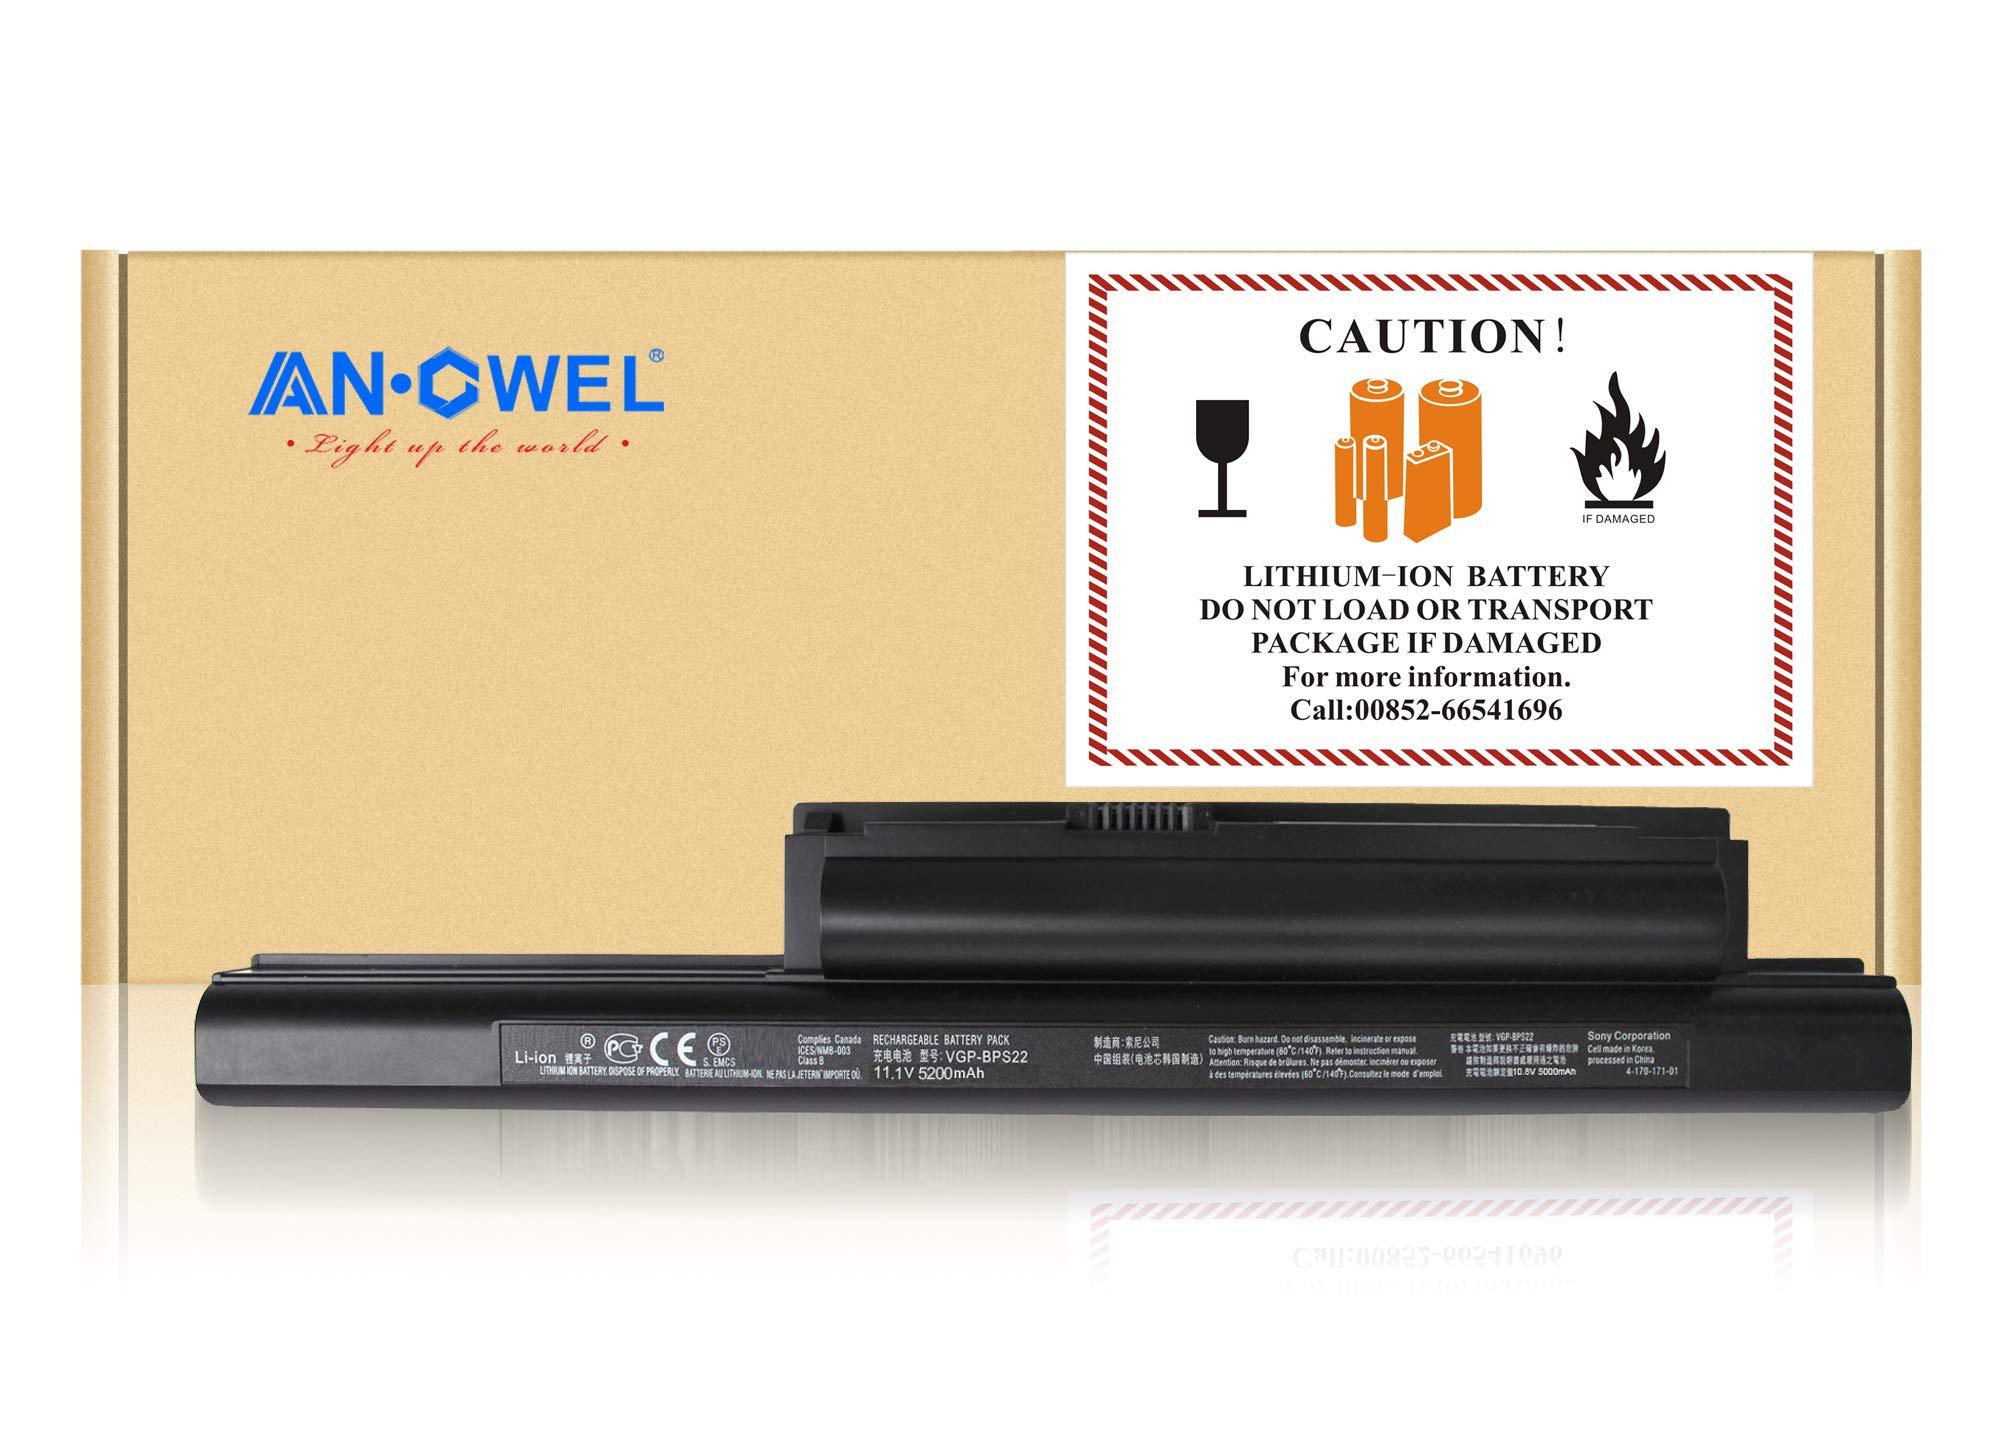 Bateria 10.8v 5000mah Sony Vgp-bps22 With:sony Vaio Vpc-eb18